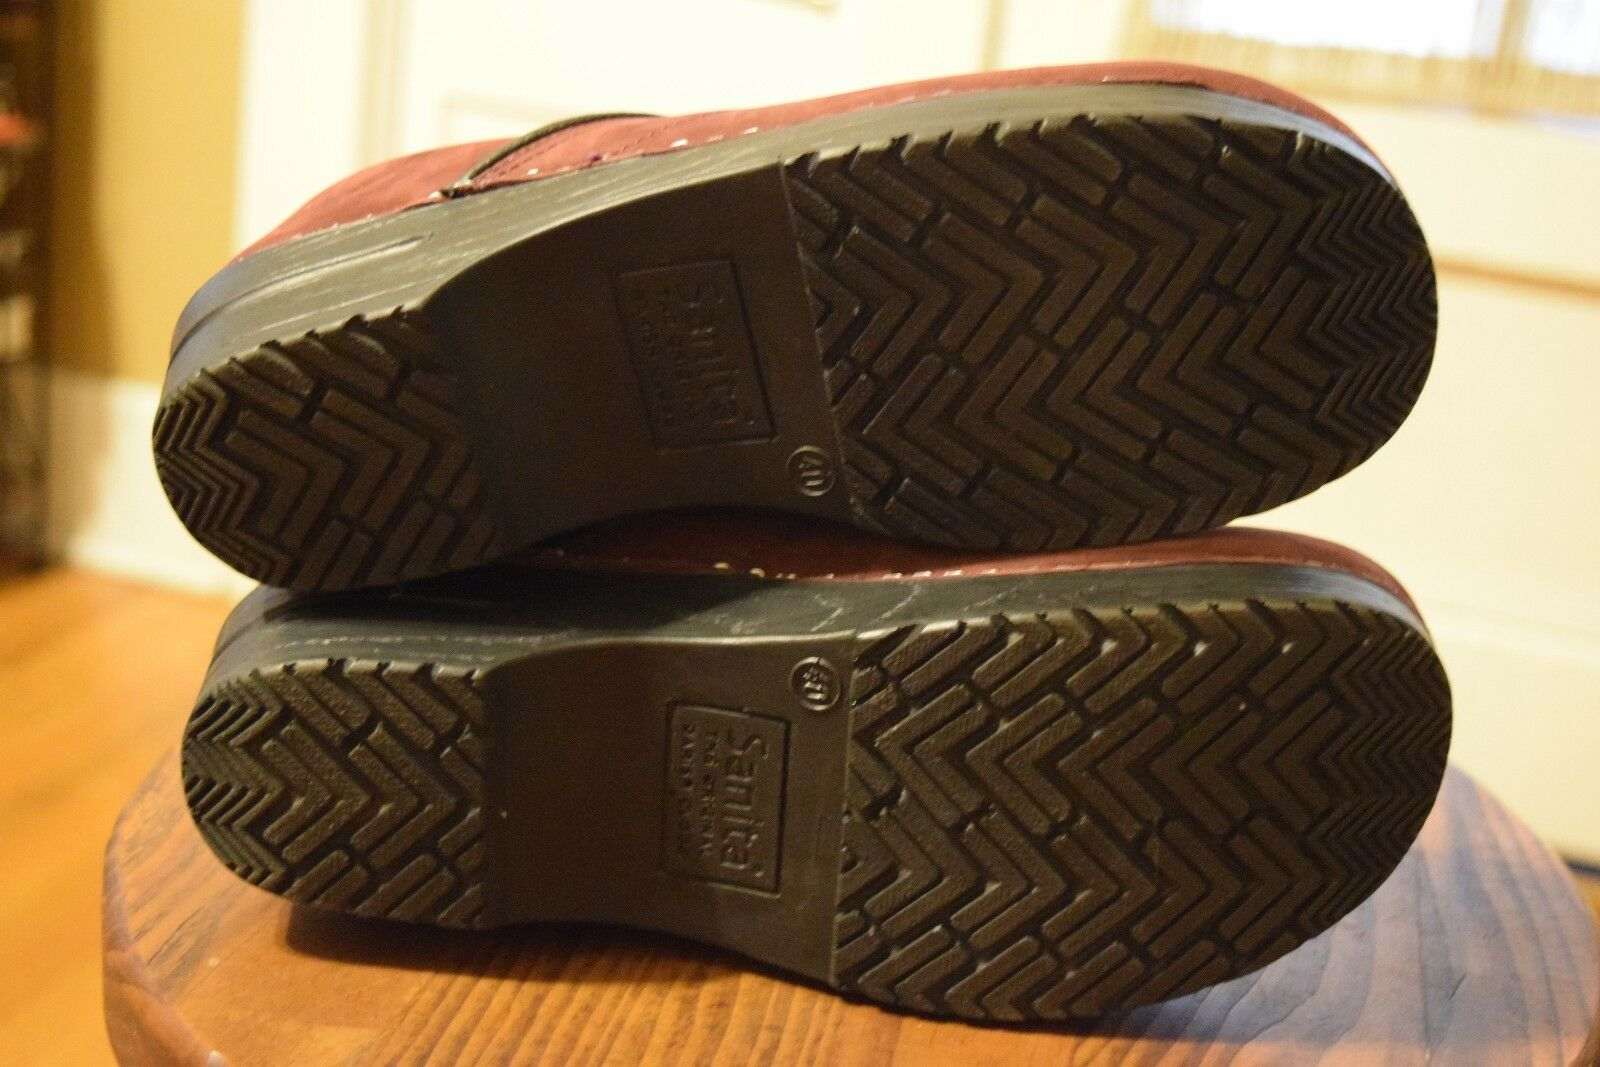 Zuecos Sanita Profesional mujer Borgoa Cuero Comodidad Zapatos para mujer Profesional 9-9.5 7f873a